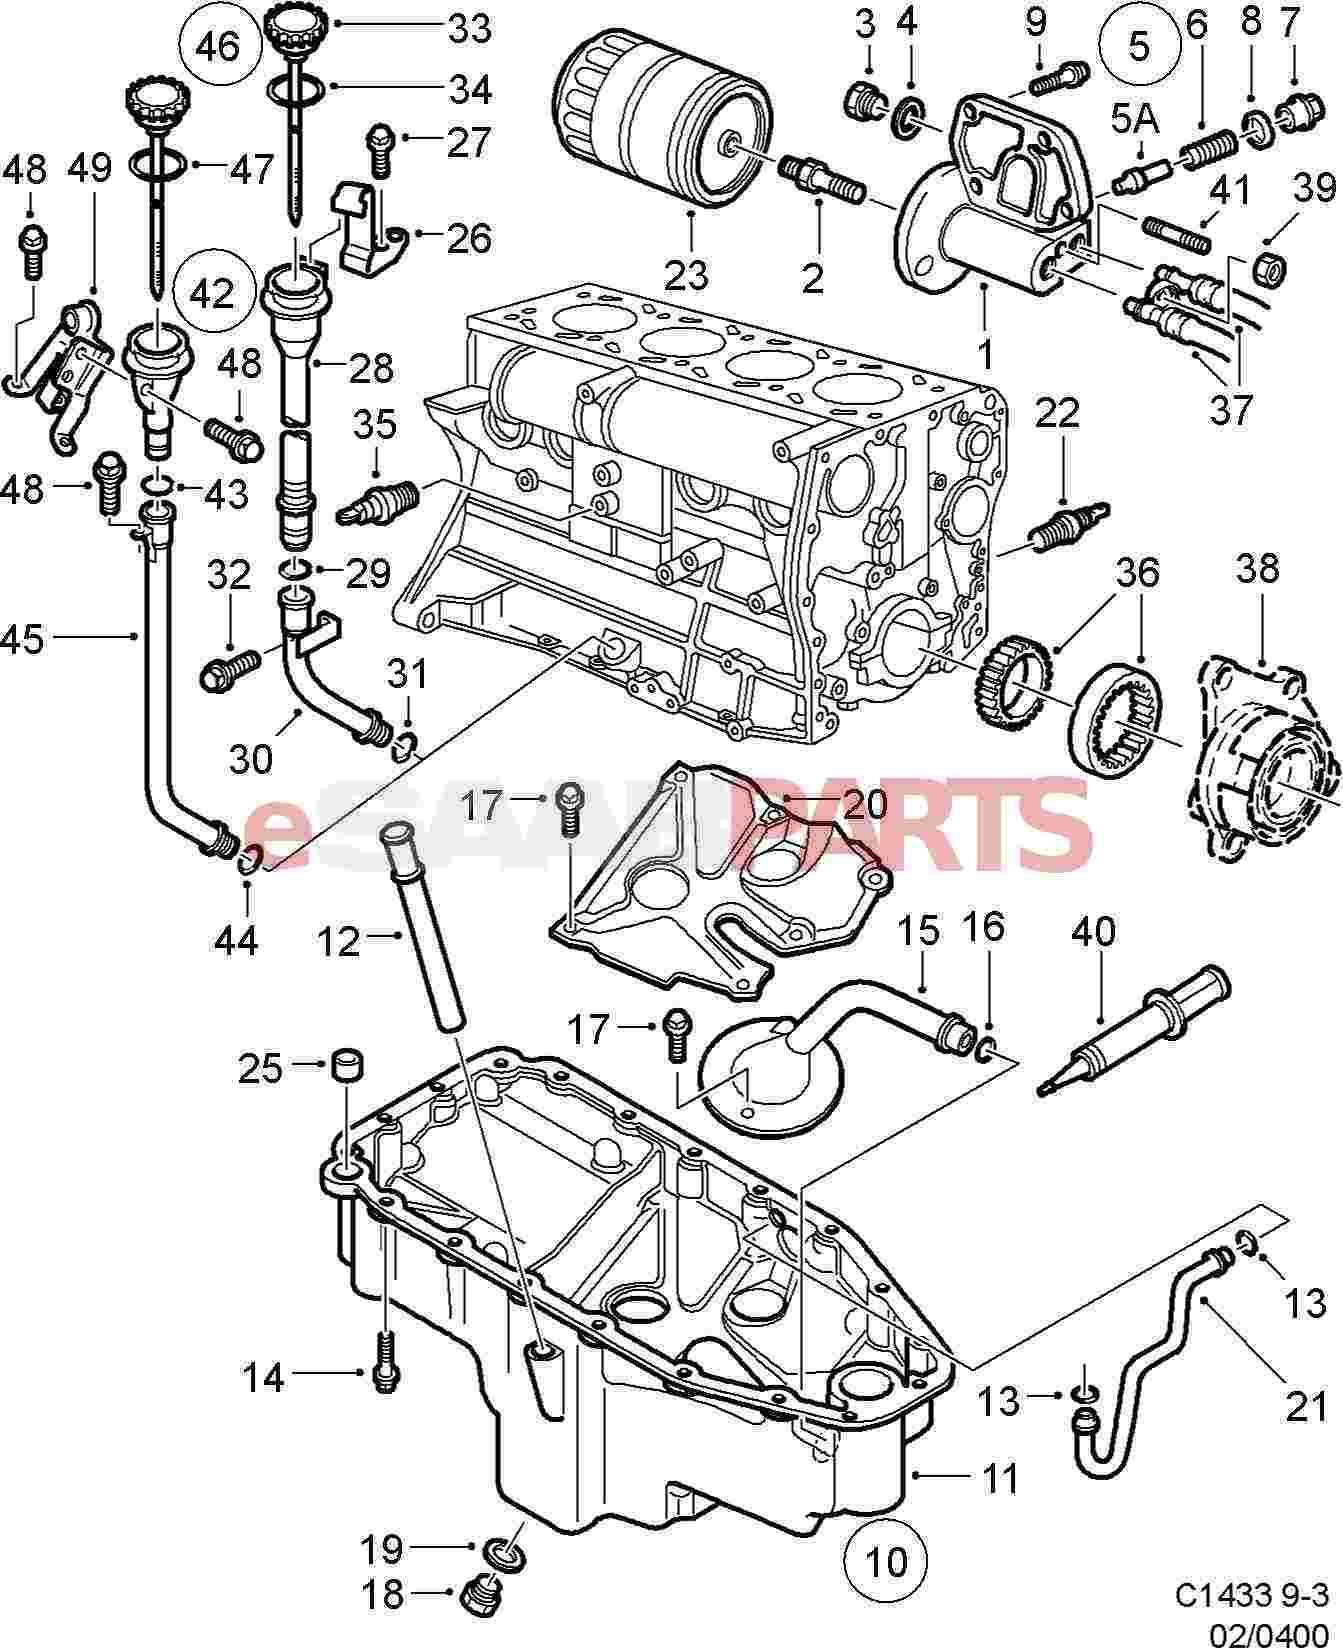 hight resolution of saab 2000 9 5 engine diagram oil wiring diagram completed 2005 saab 9 5 engine